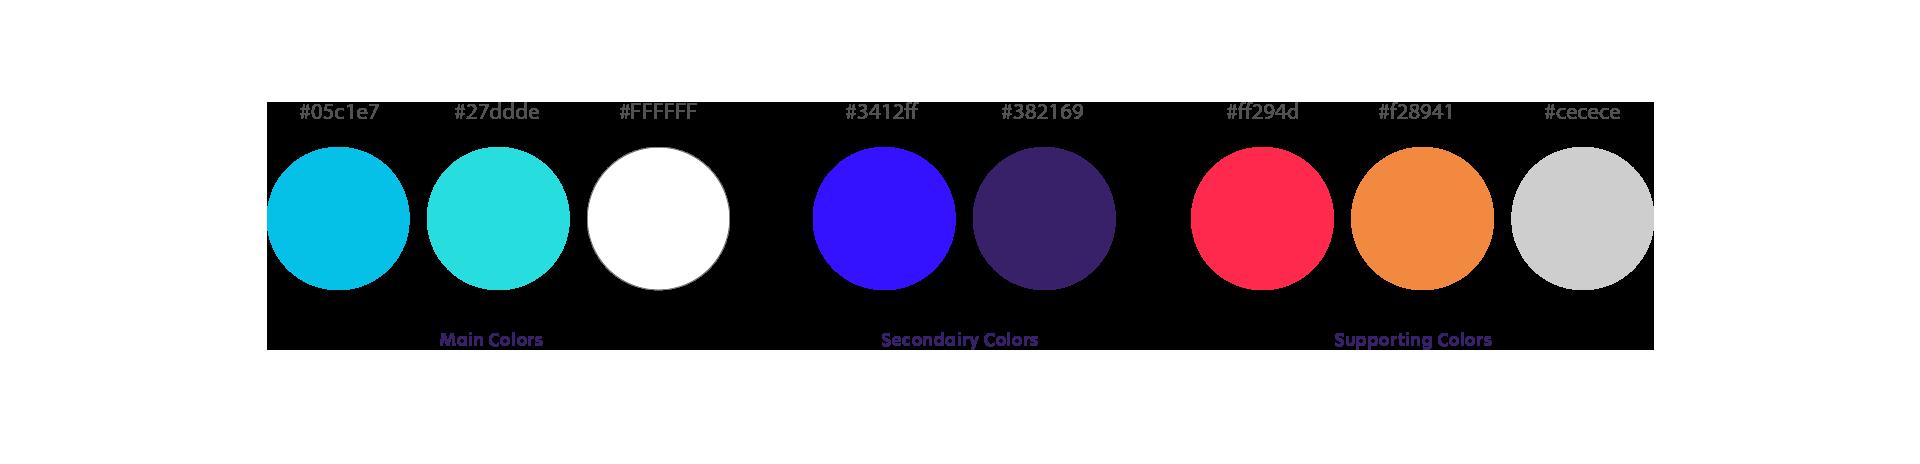 colors-happ